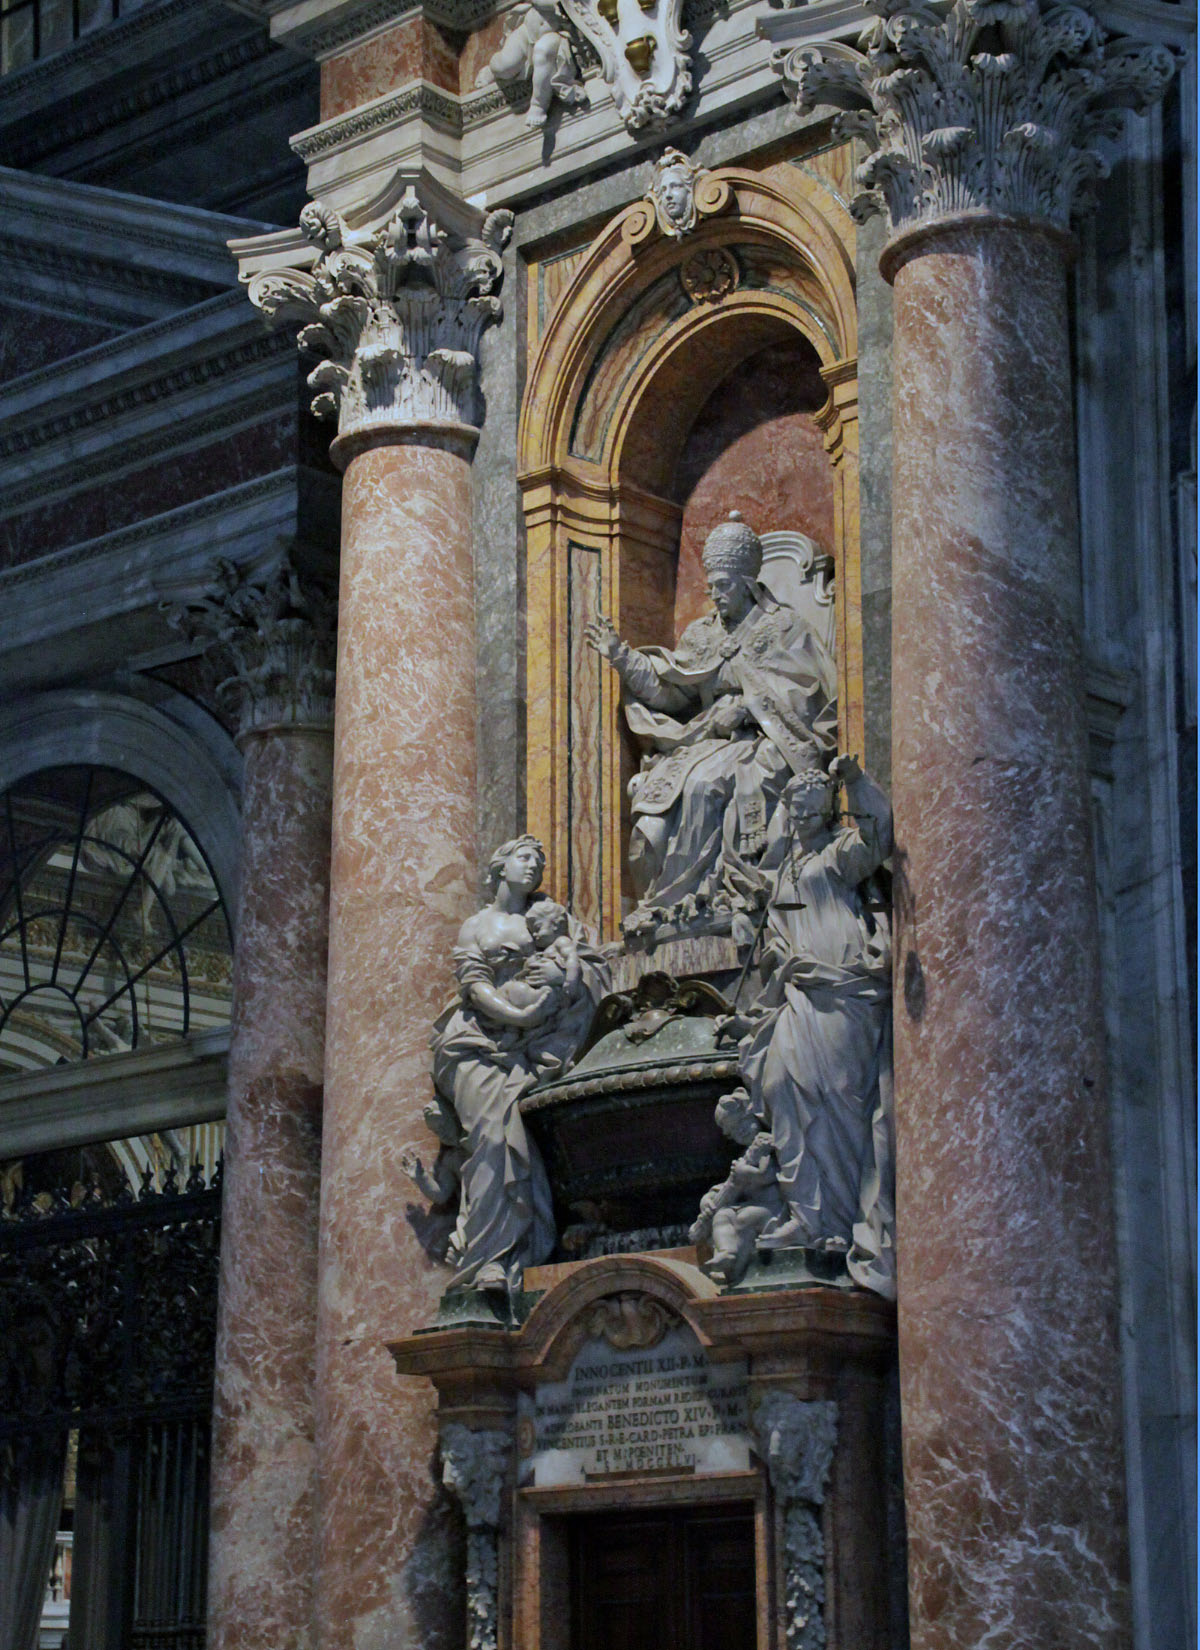 St. Peter's Basilica Carvings